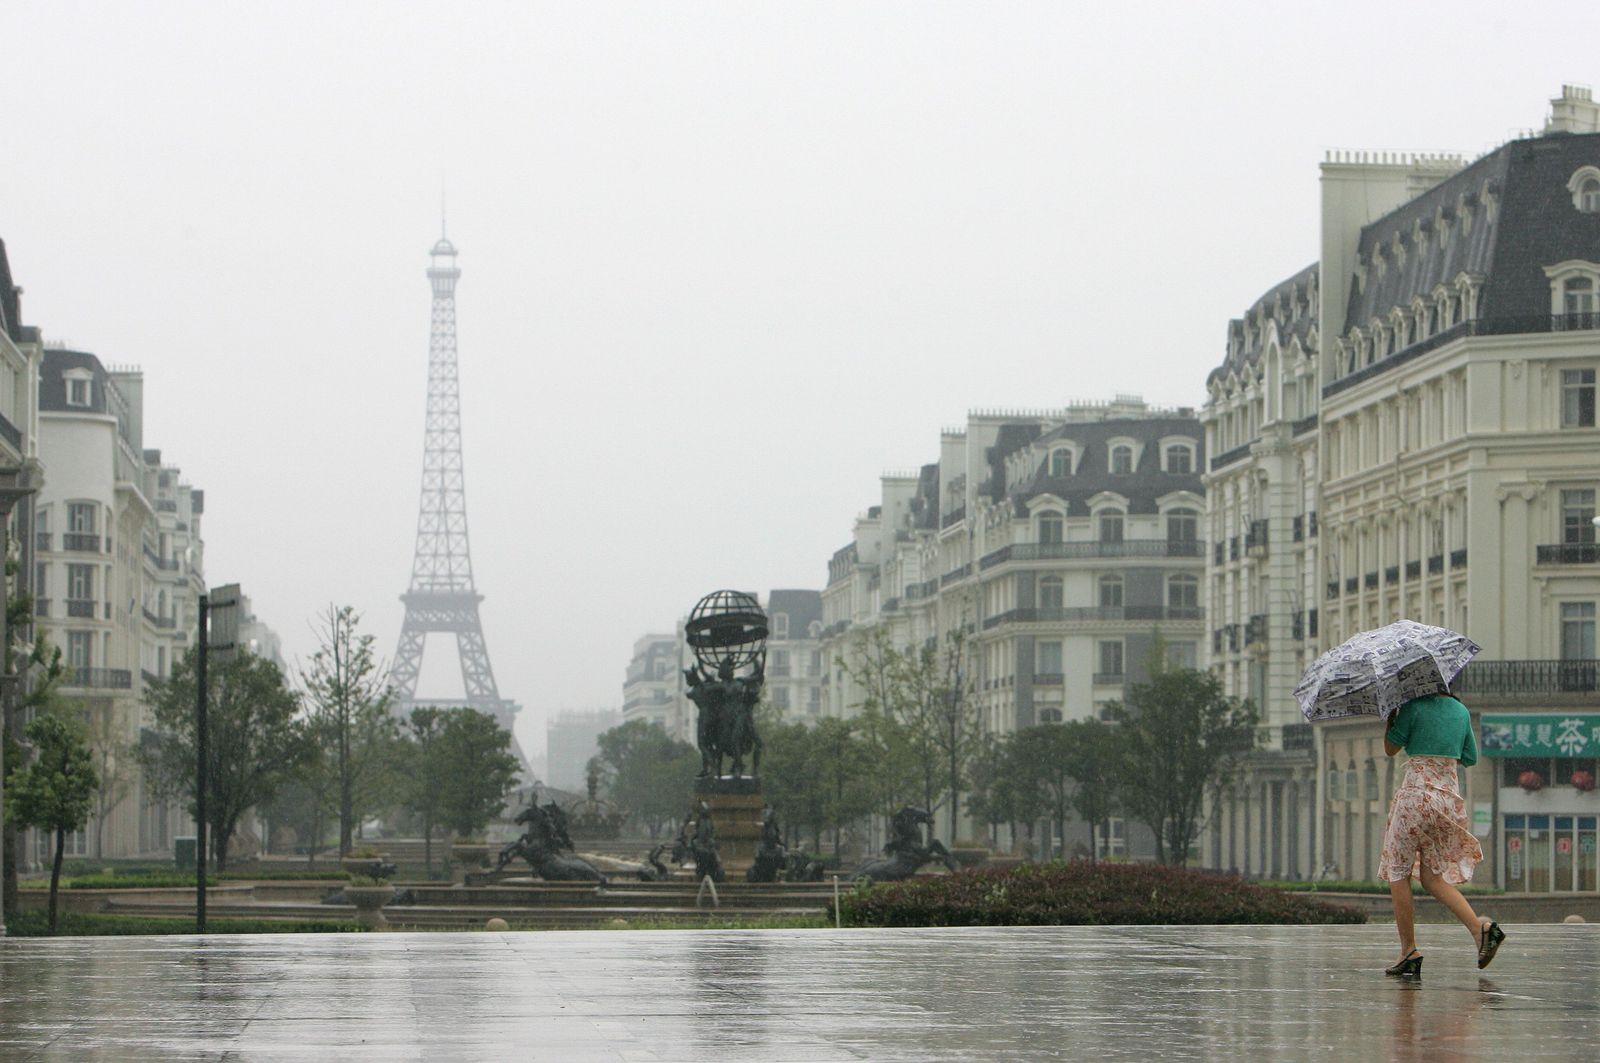 Eifelturm / Mini-Paris / China